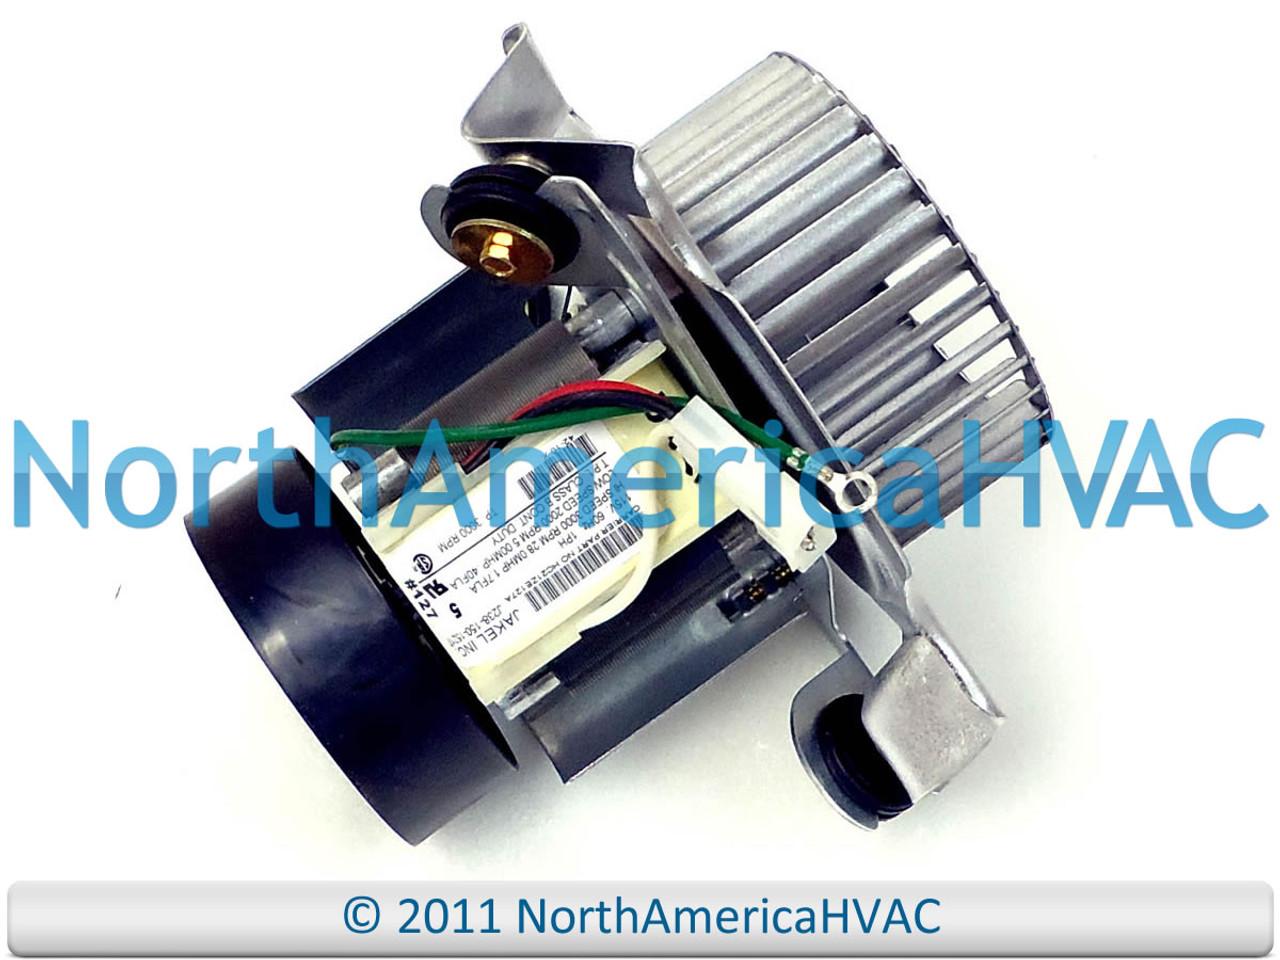 furnace exhaust draft inducer motor fits carrier bryant payne jakel j238 150 15217 furnace exhuast